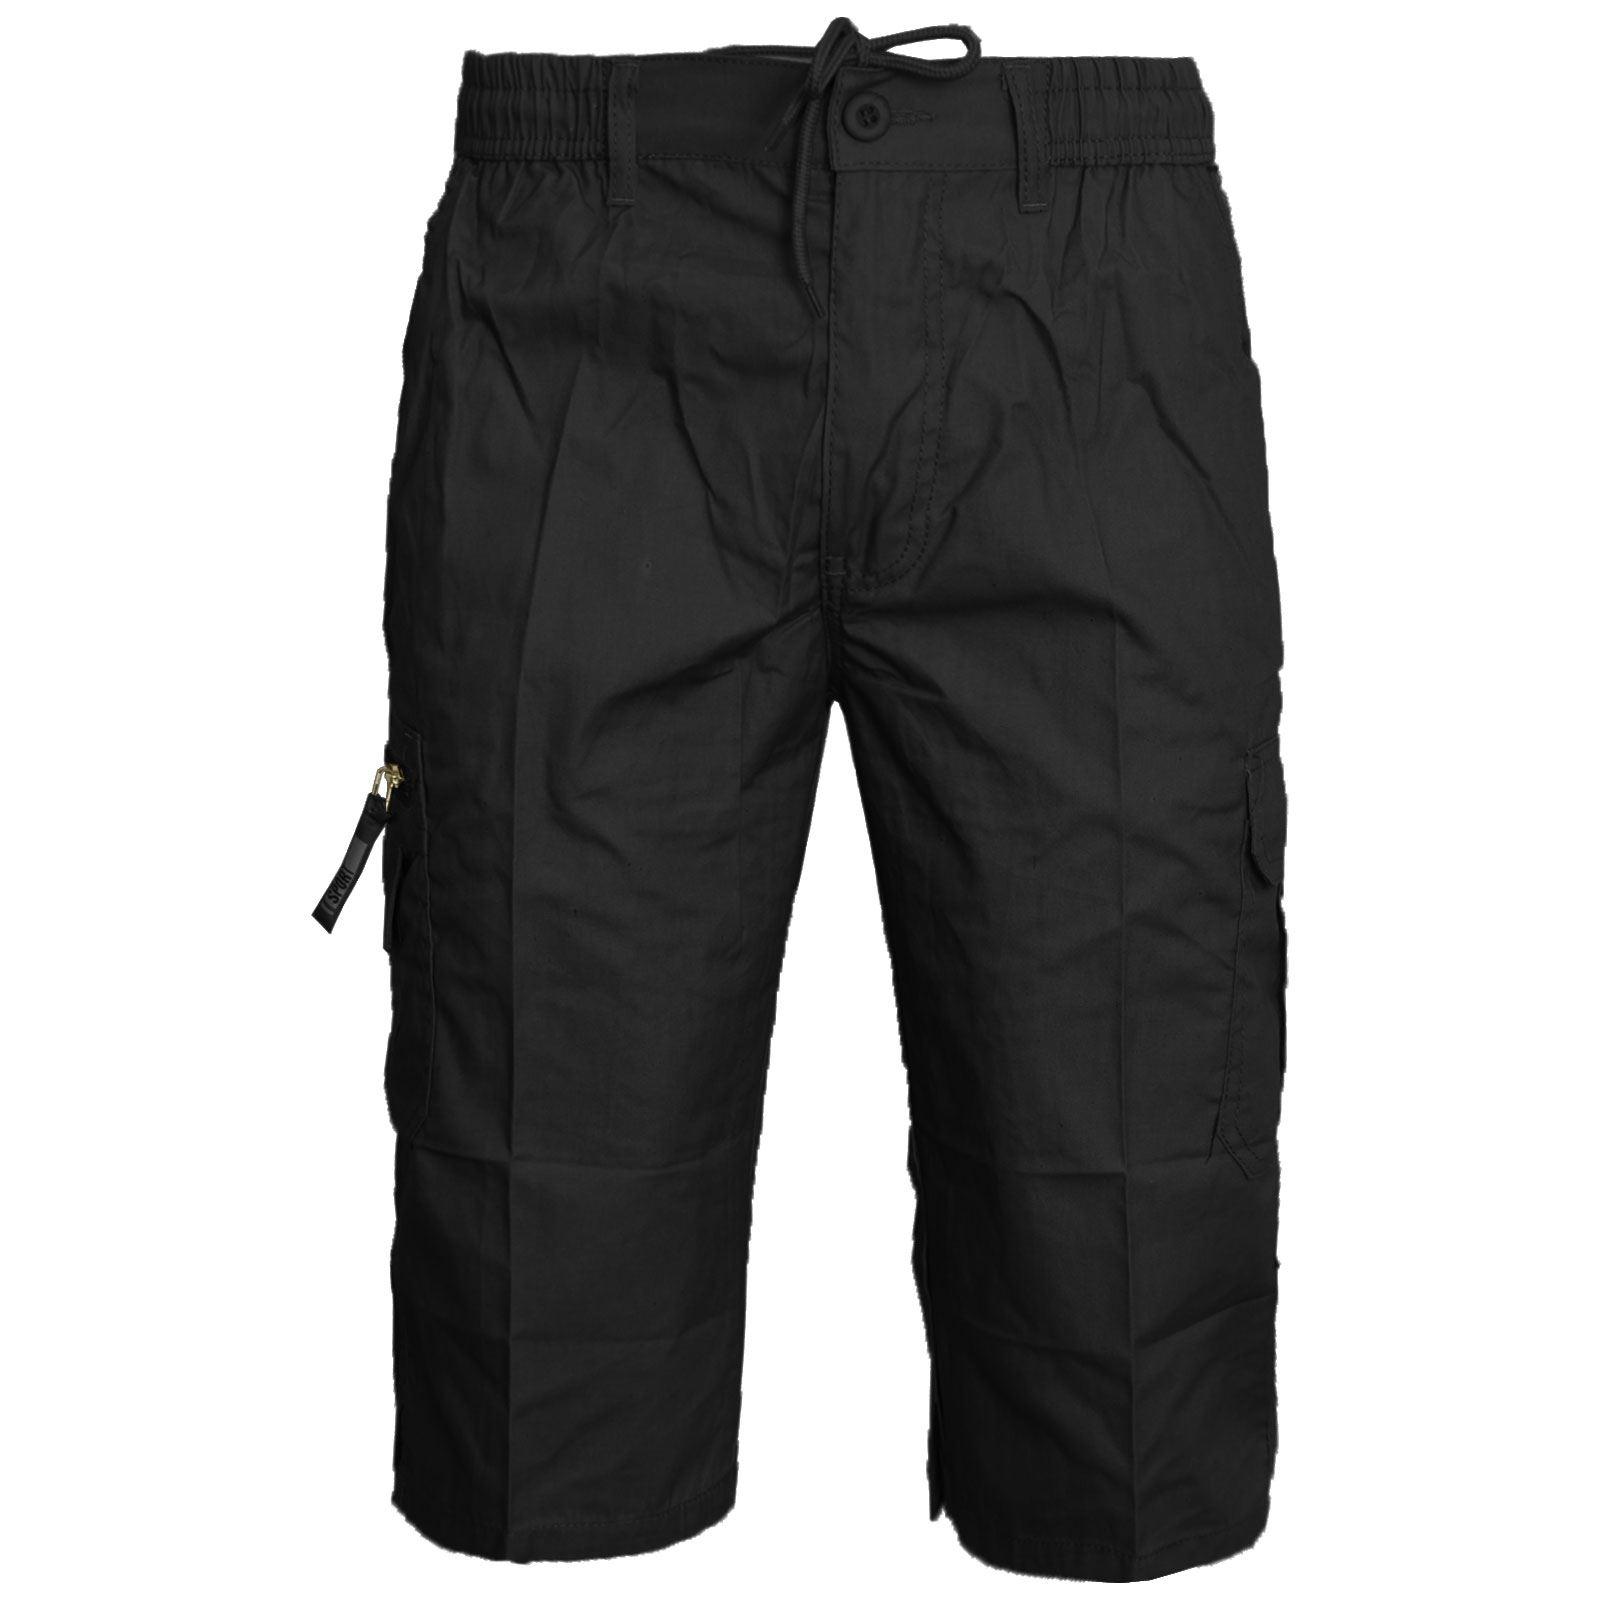 Nuevo-pantalon-corto-para-hombre-Plain-3-4-Verano-Cintura-Elastica-Pantalones-Cargo-Combate-Largo-3 miniatura 25